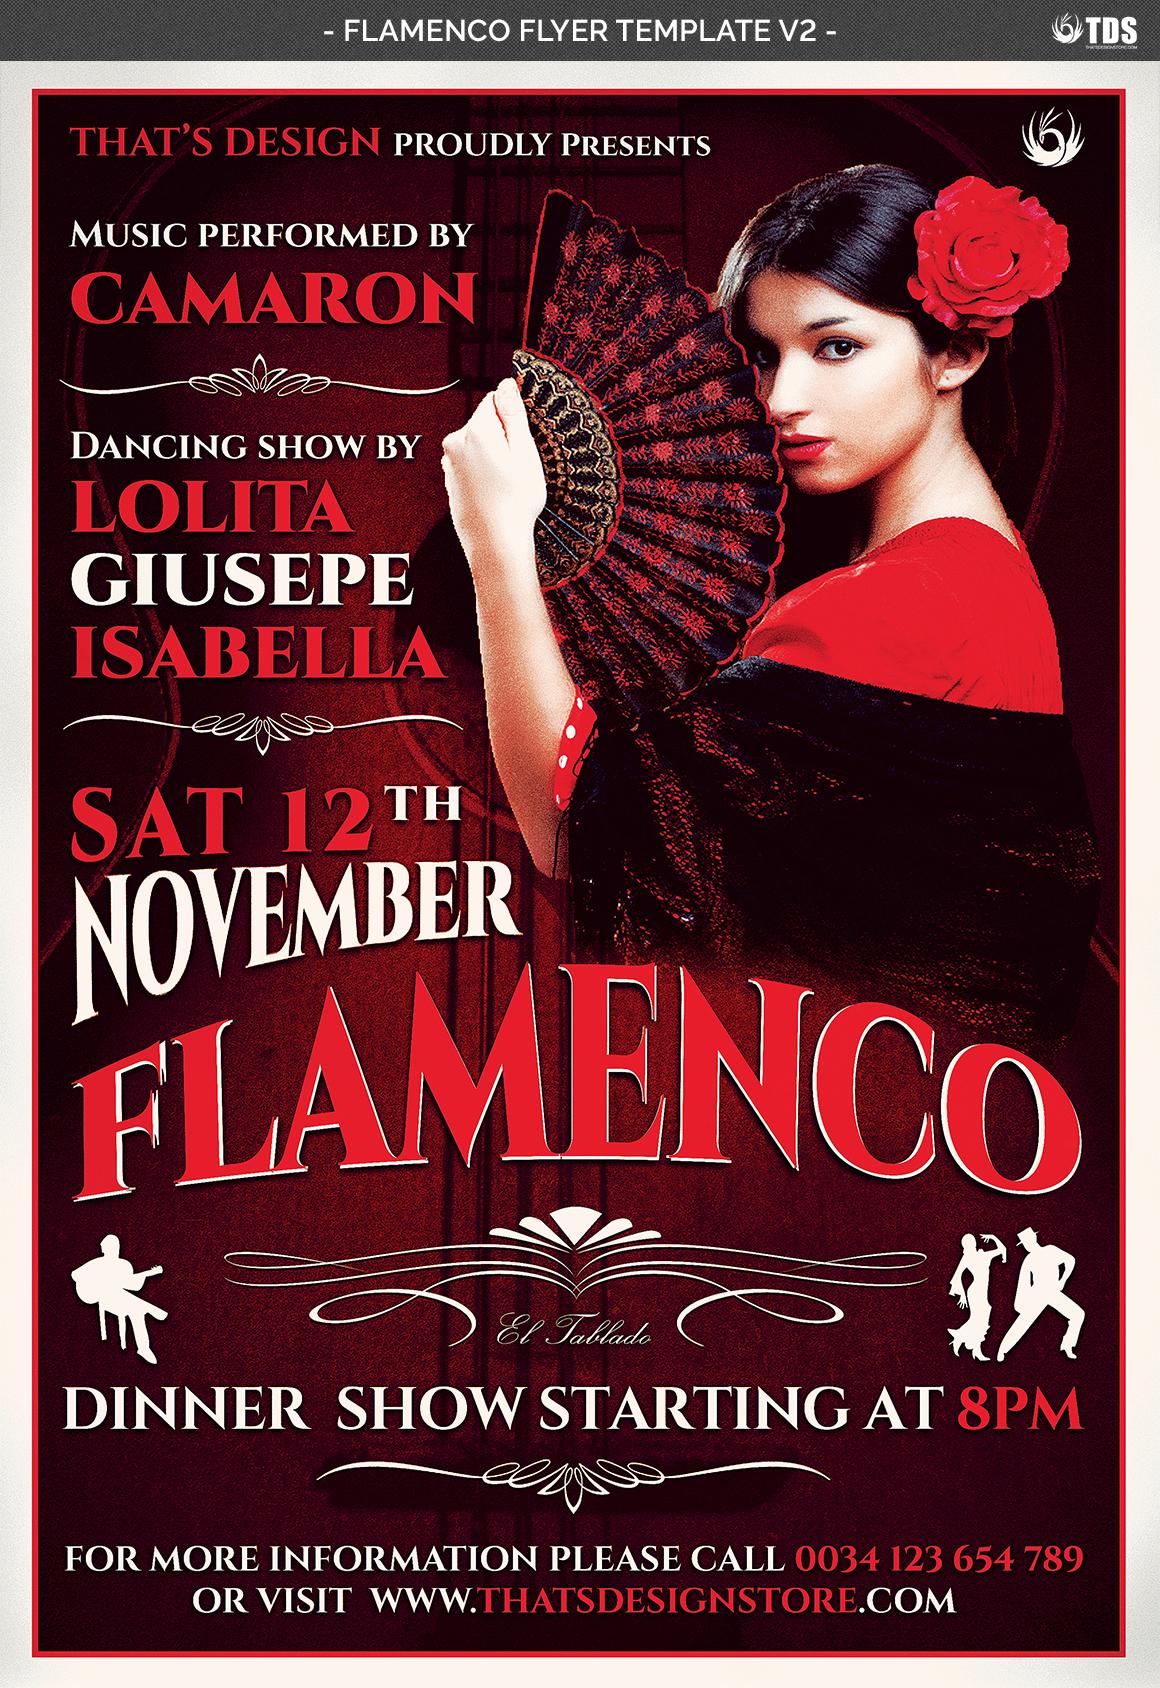 Flamenco Flyer Template V2 example image 4